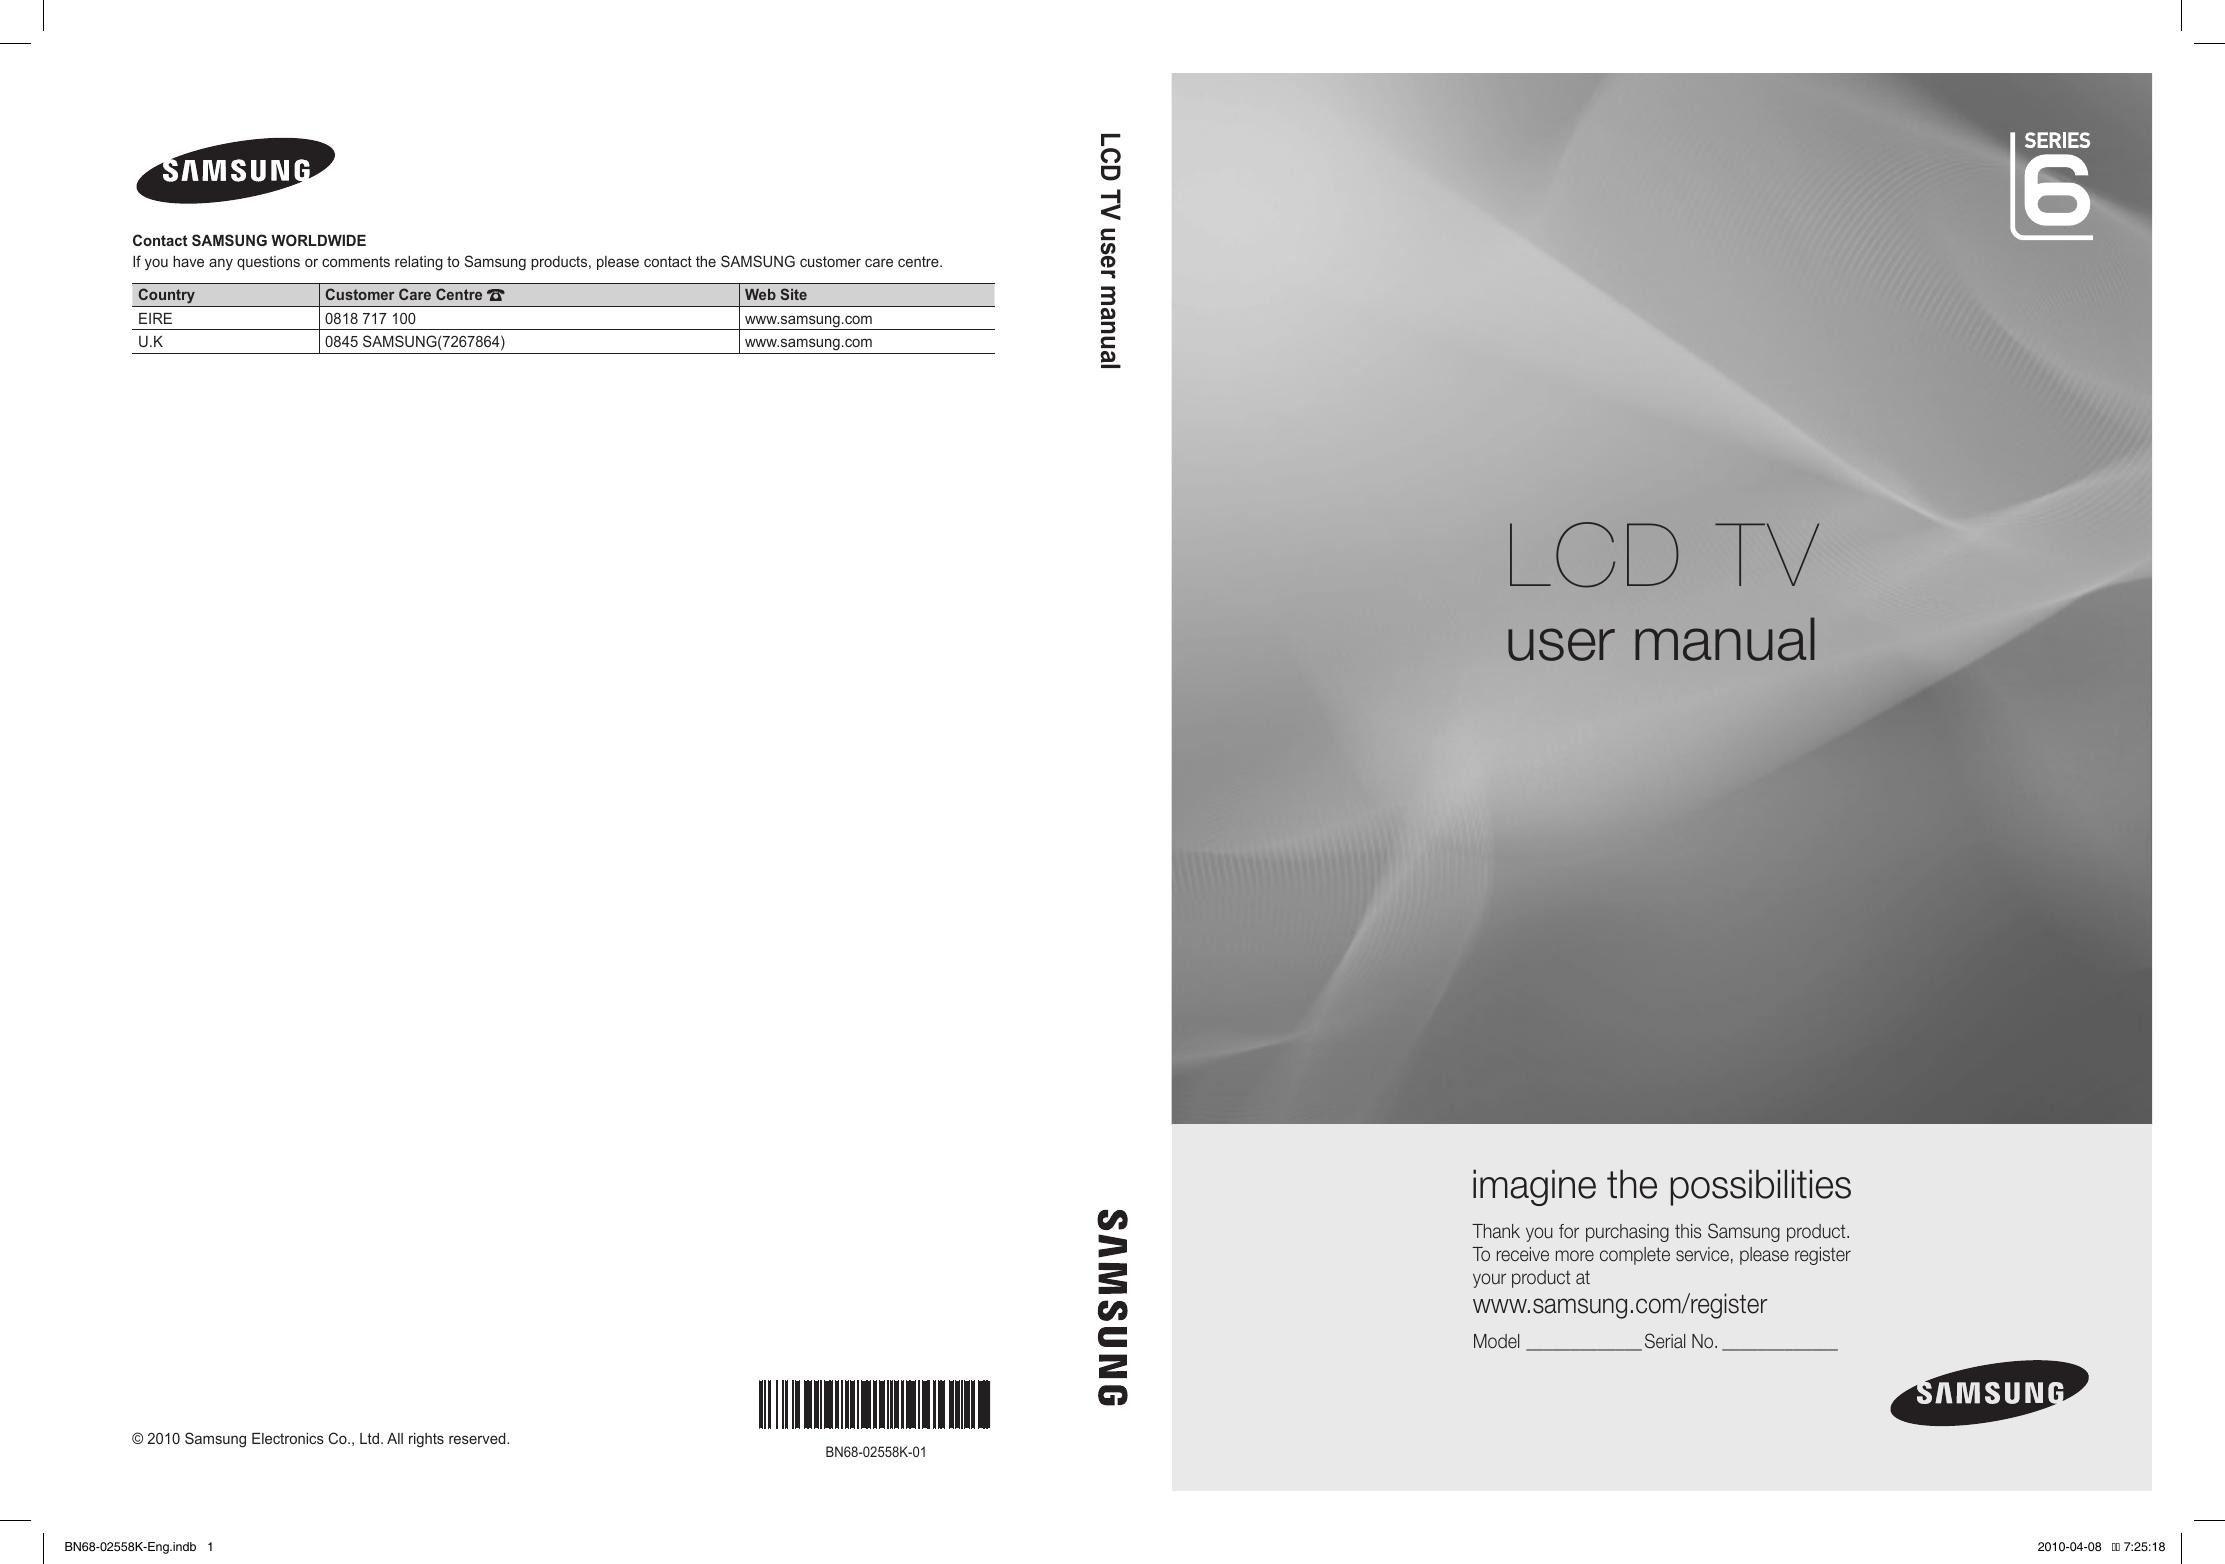 SamsungLe32C650UsersManual User Guide Page 1